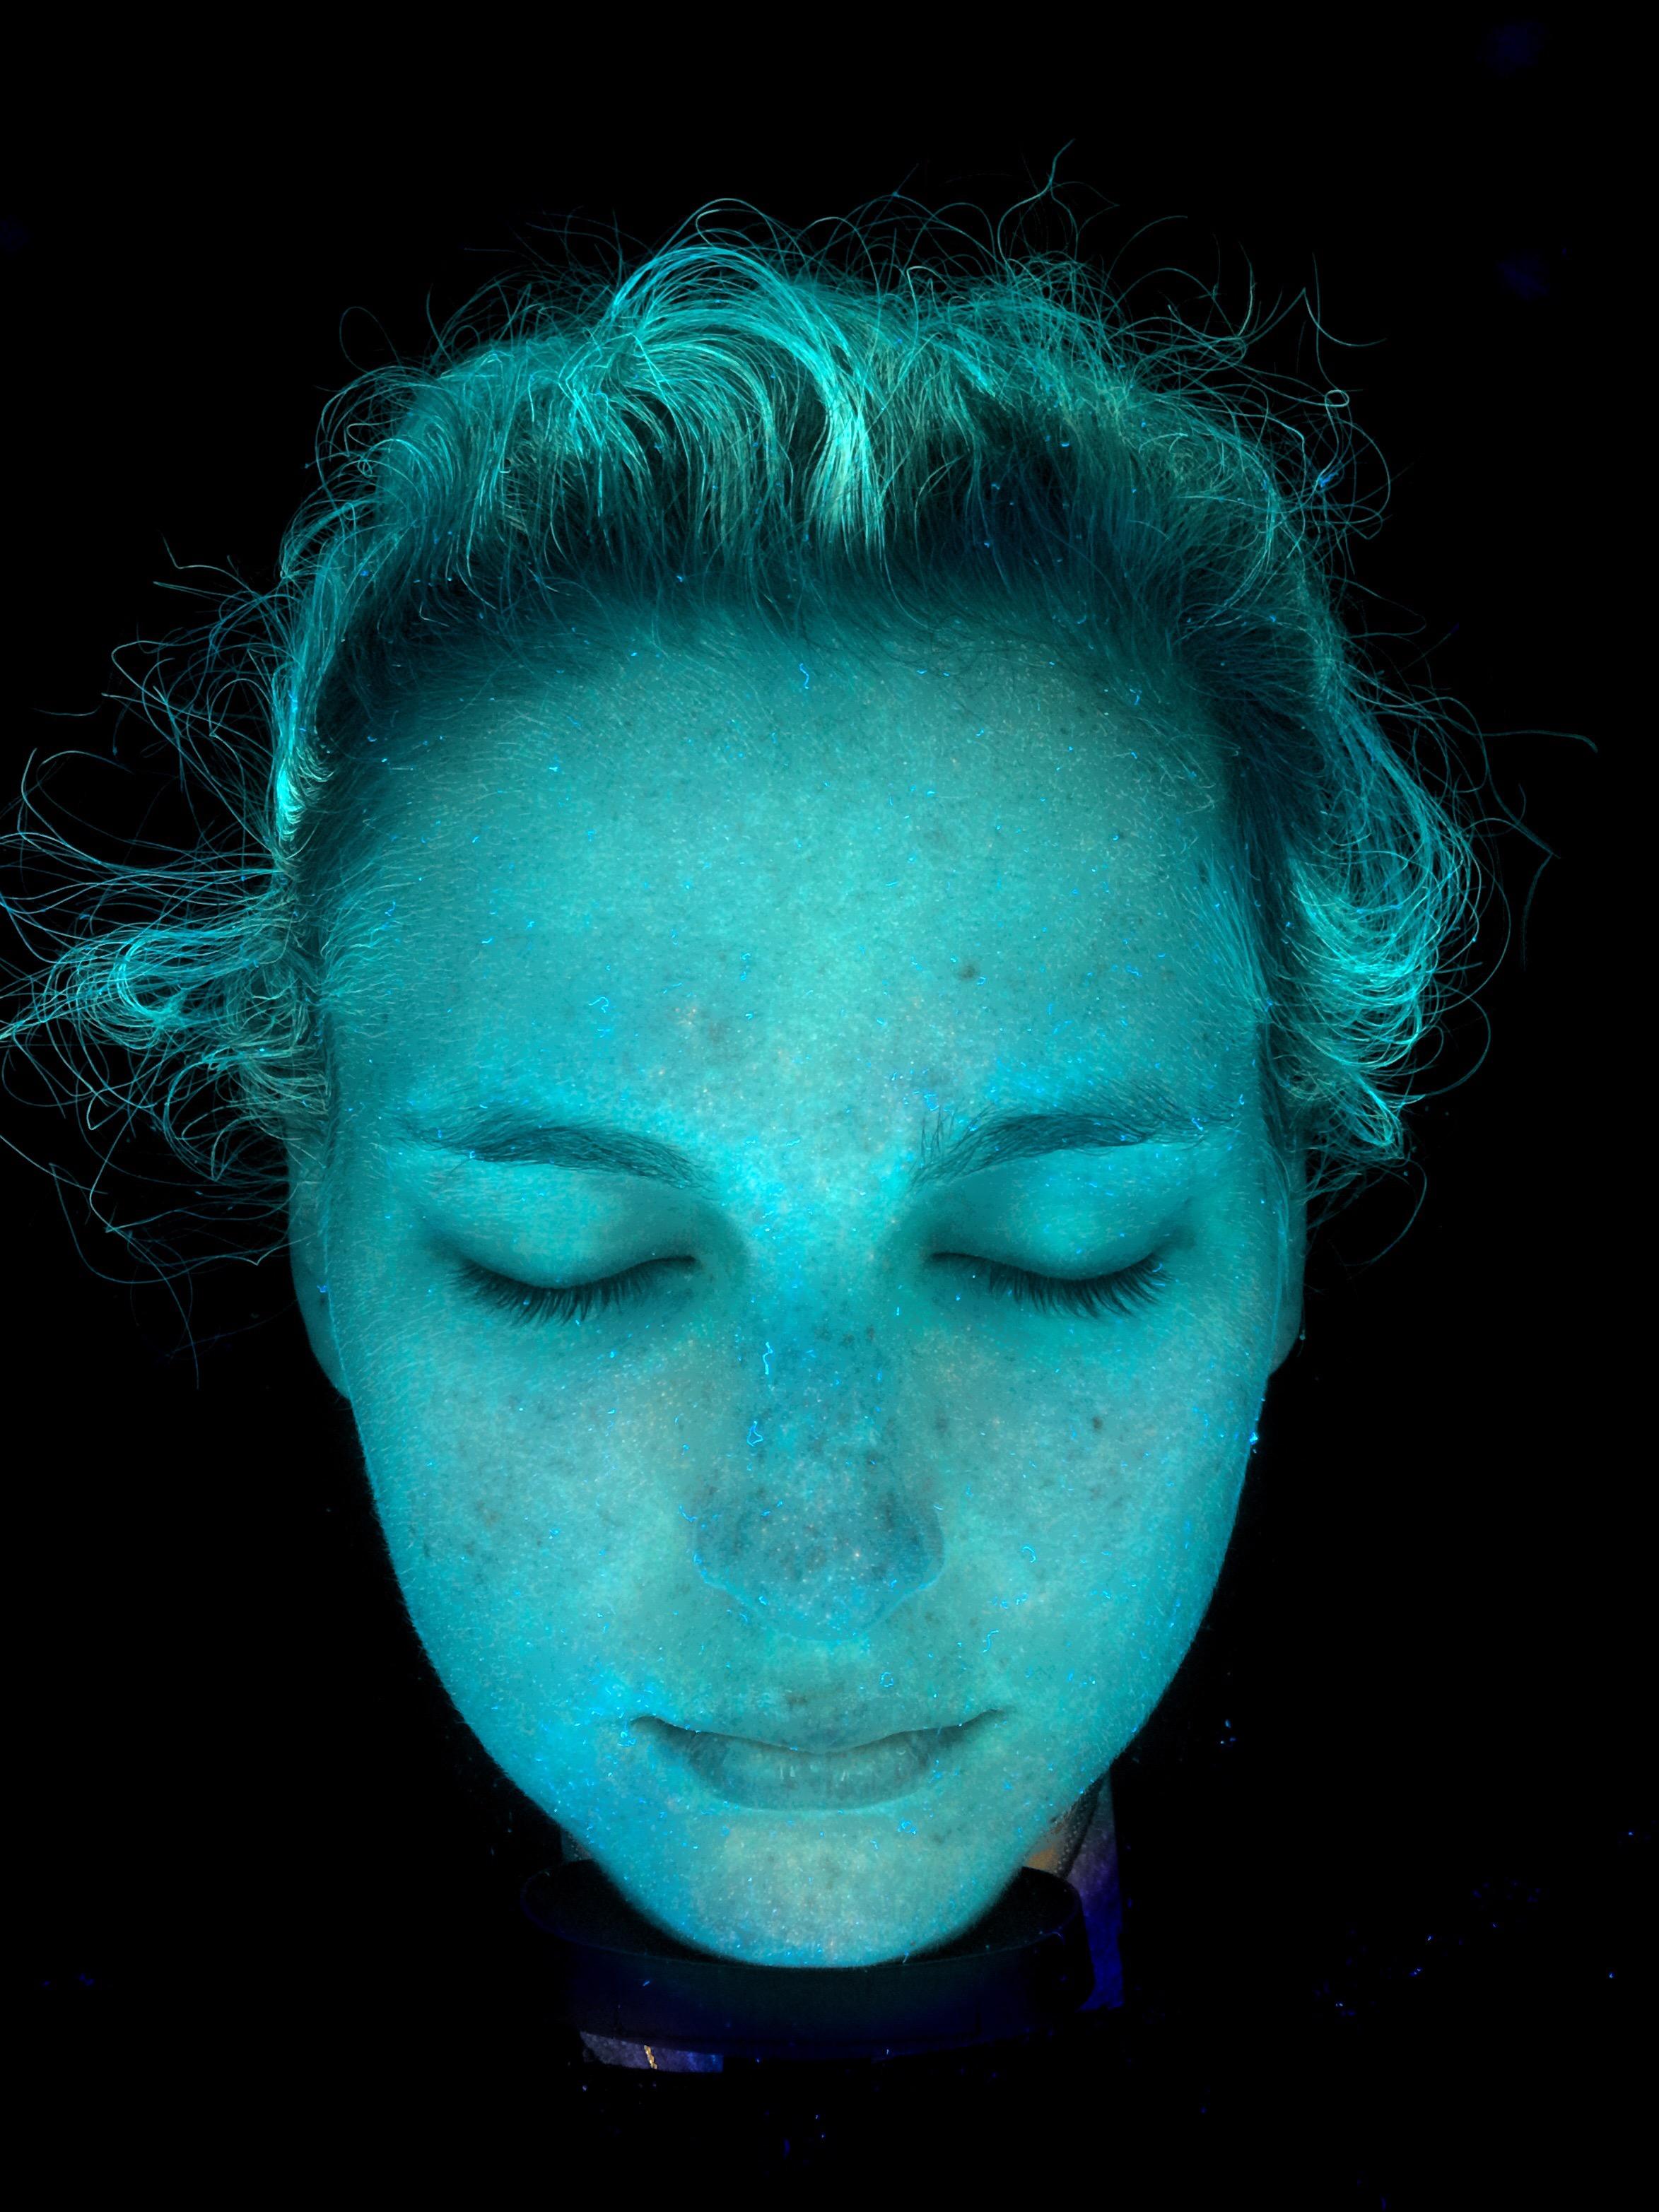 Dehydration/Lipid Dry Skin